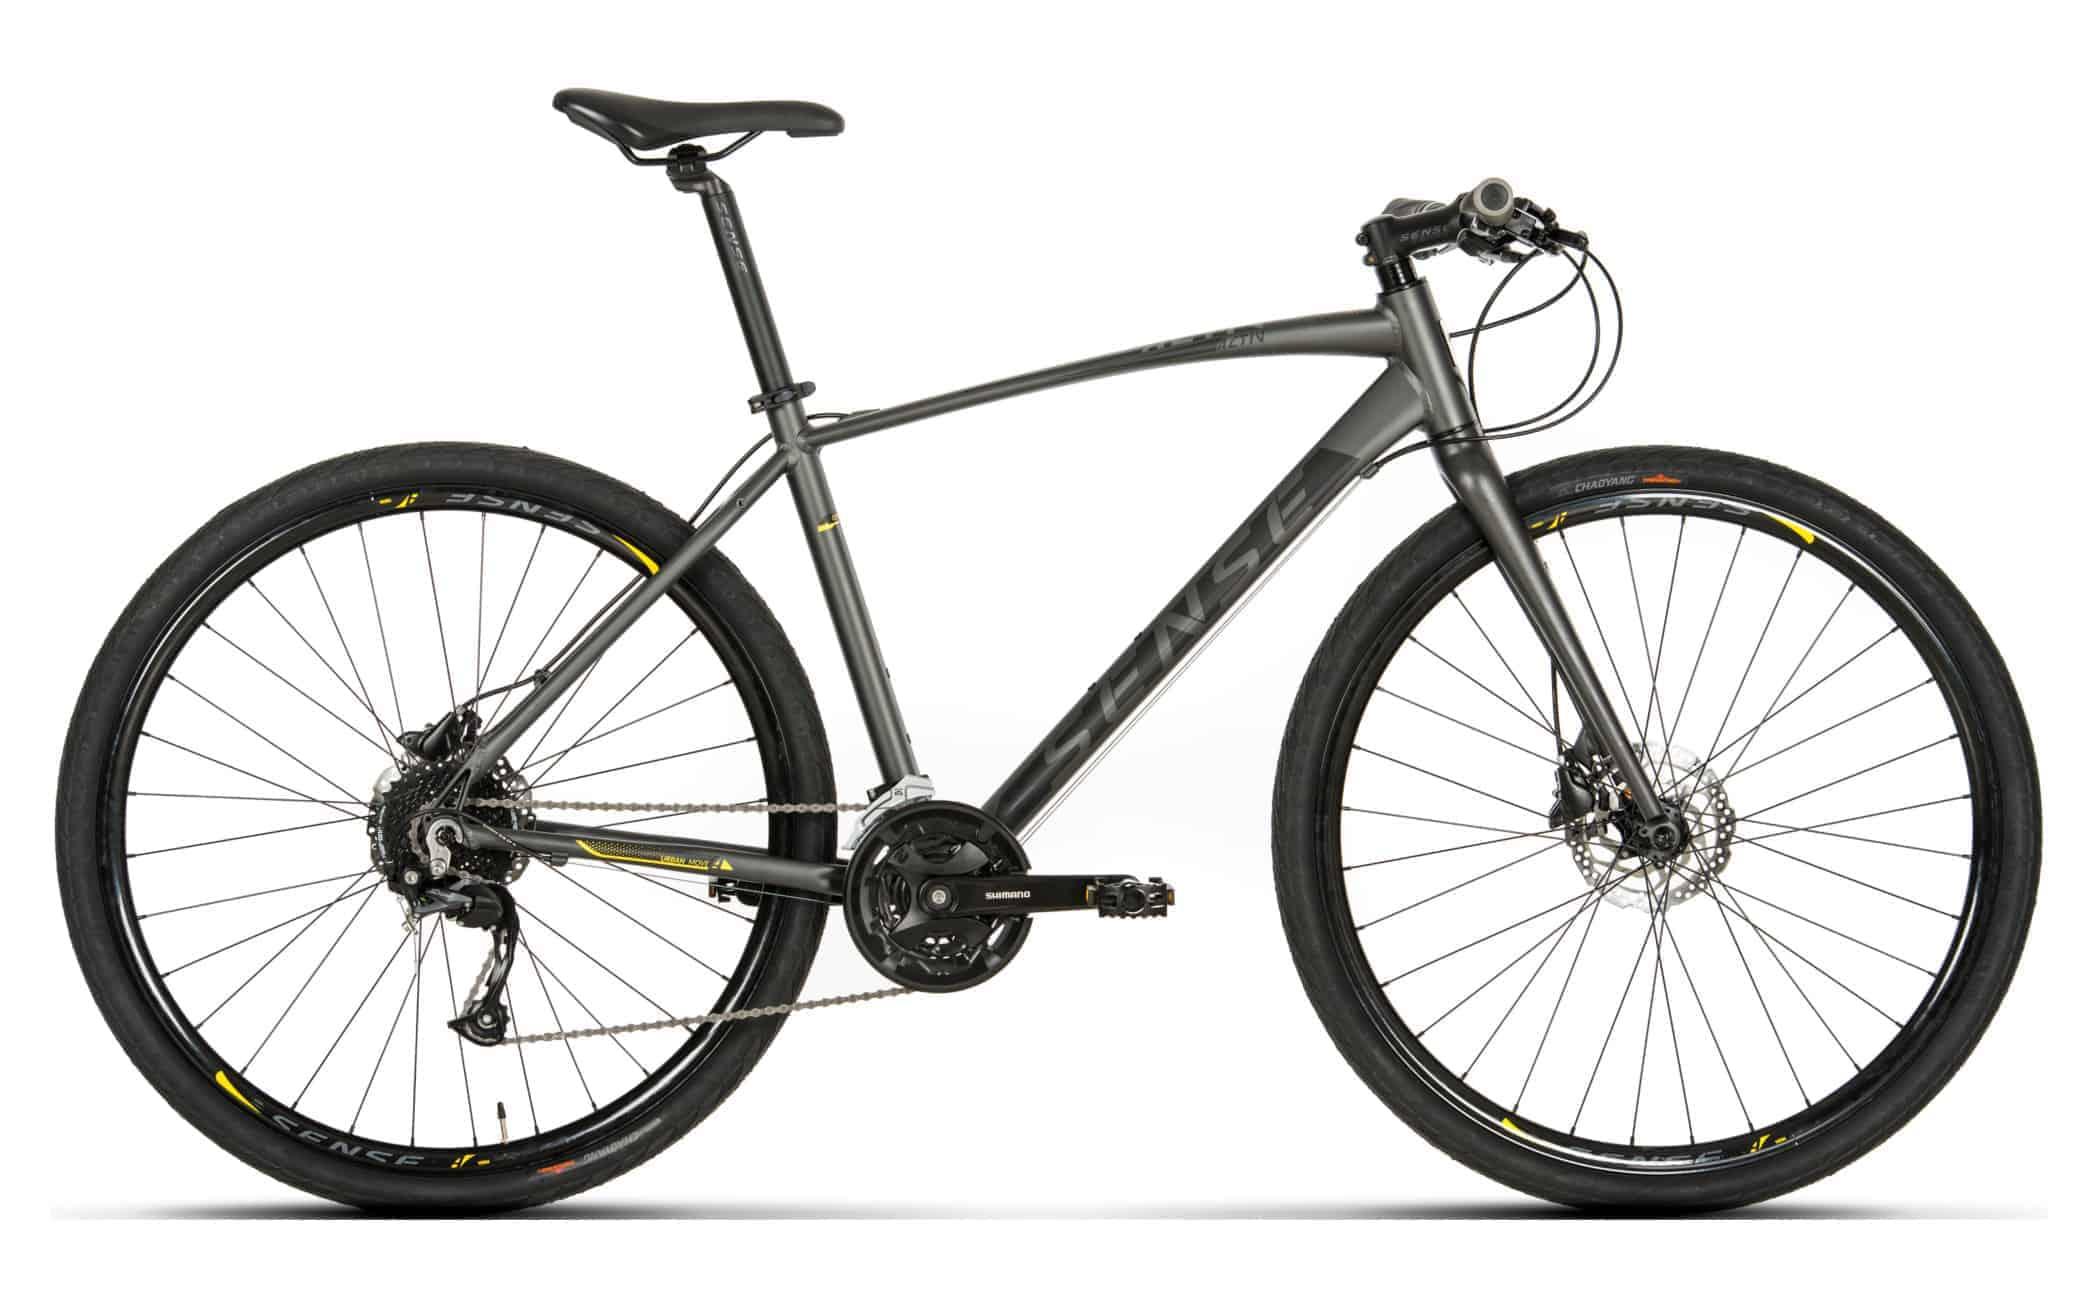 bbfa1999b Bicicleta Urbana Sense Sctiv 2019 cinza